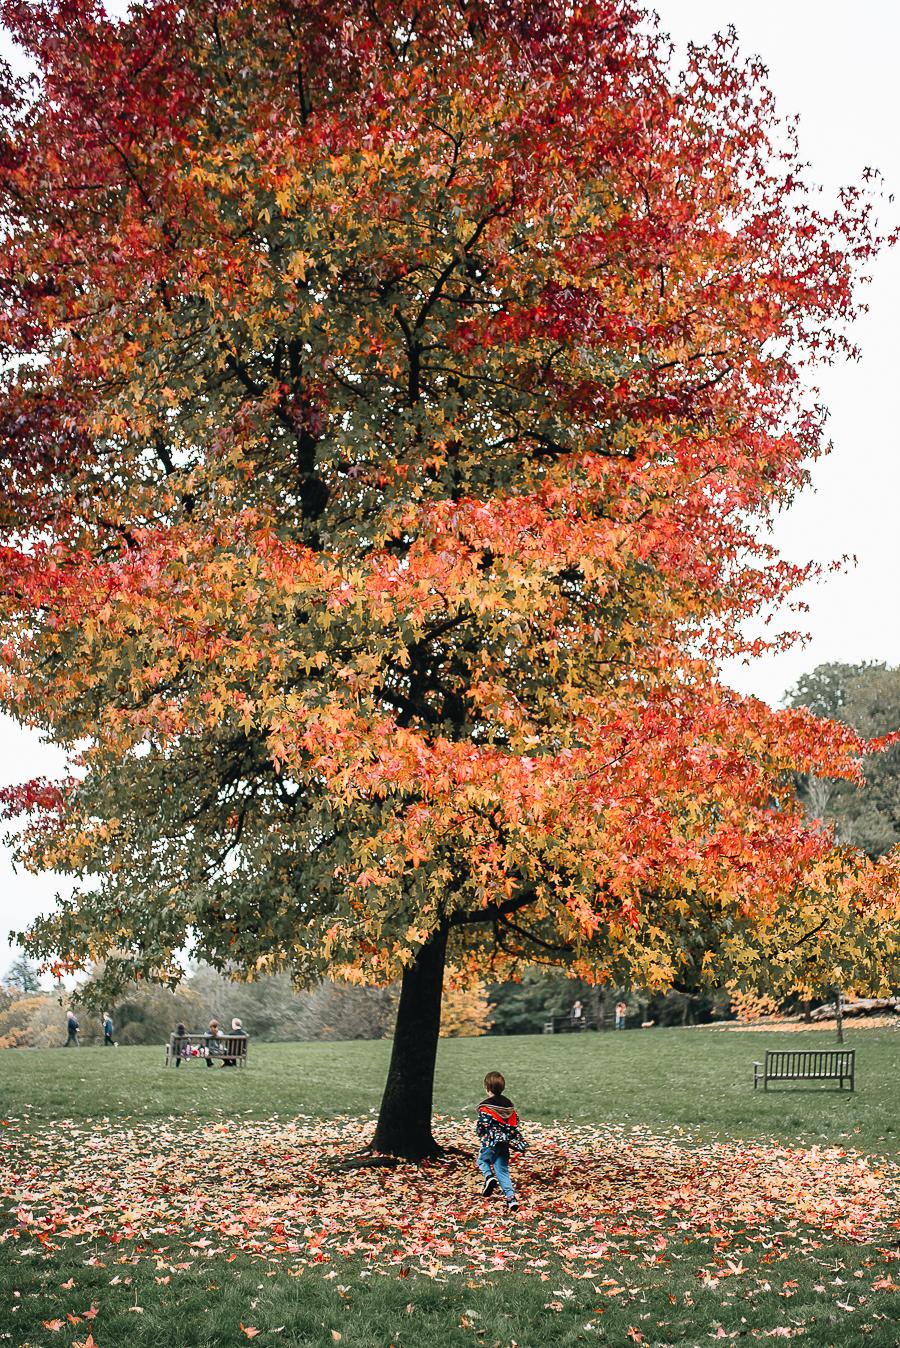 OurBeautifulAdventure-GettingOutdoorsinWales-October-websize-0134.jpg